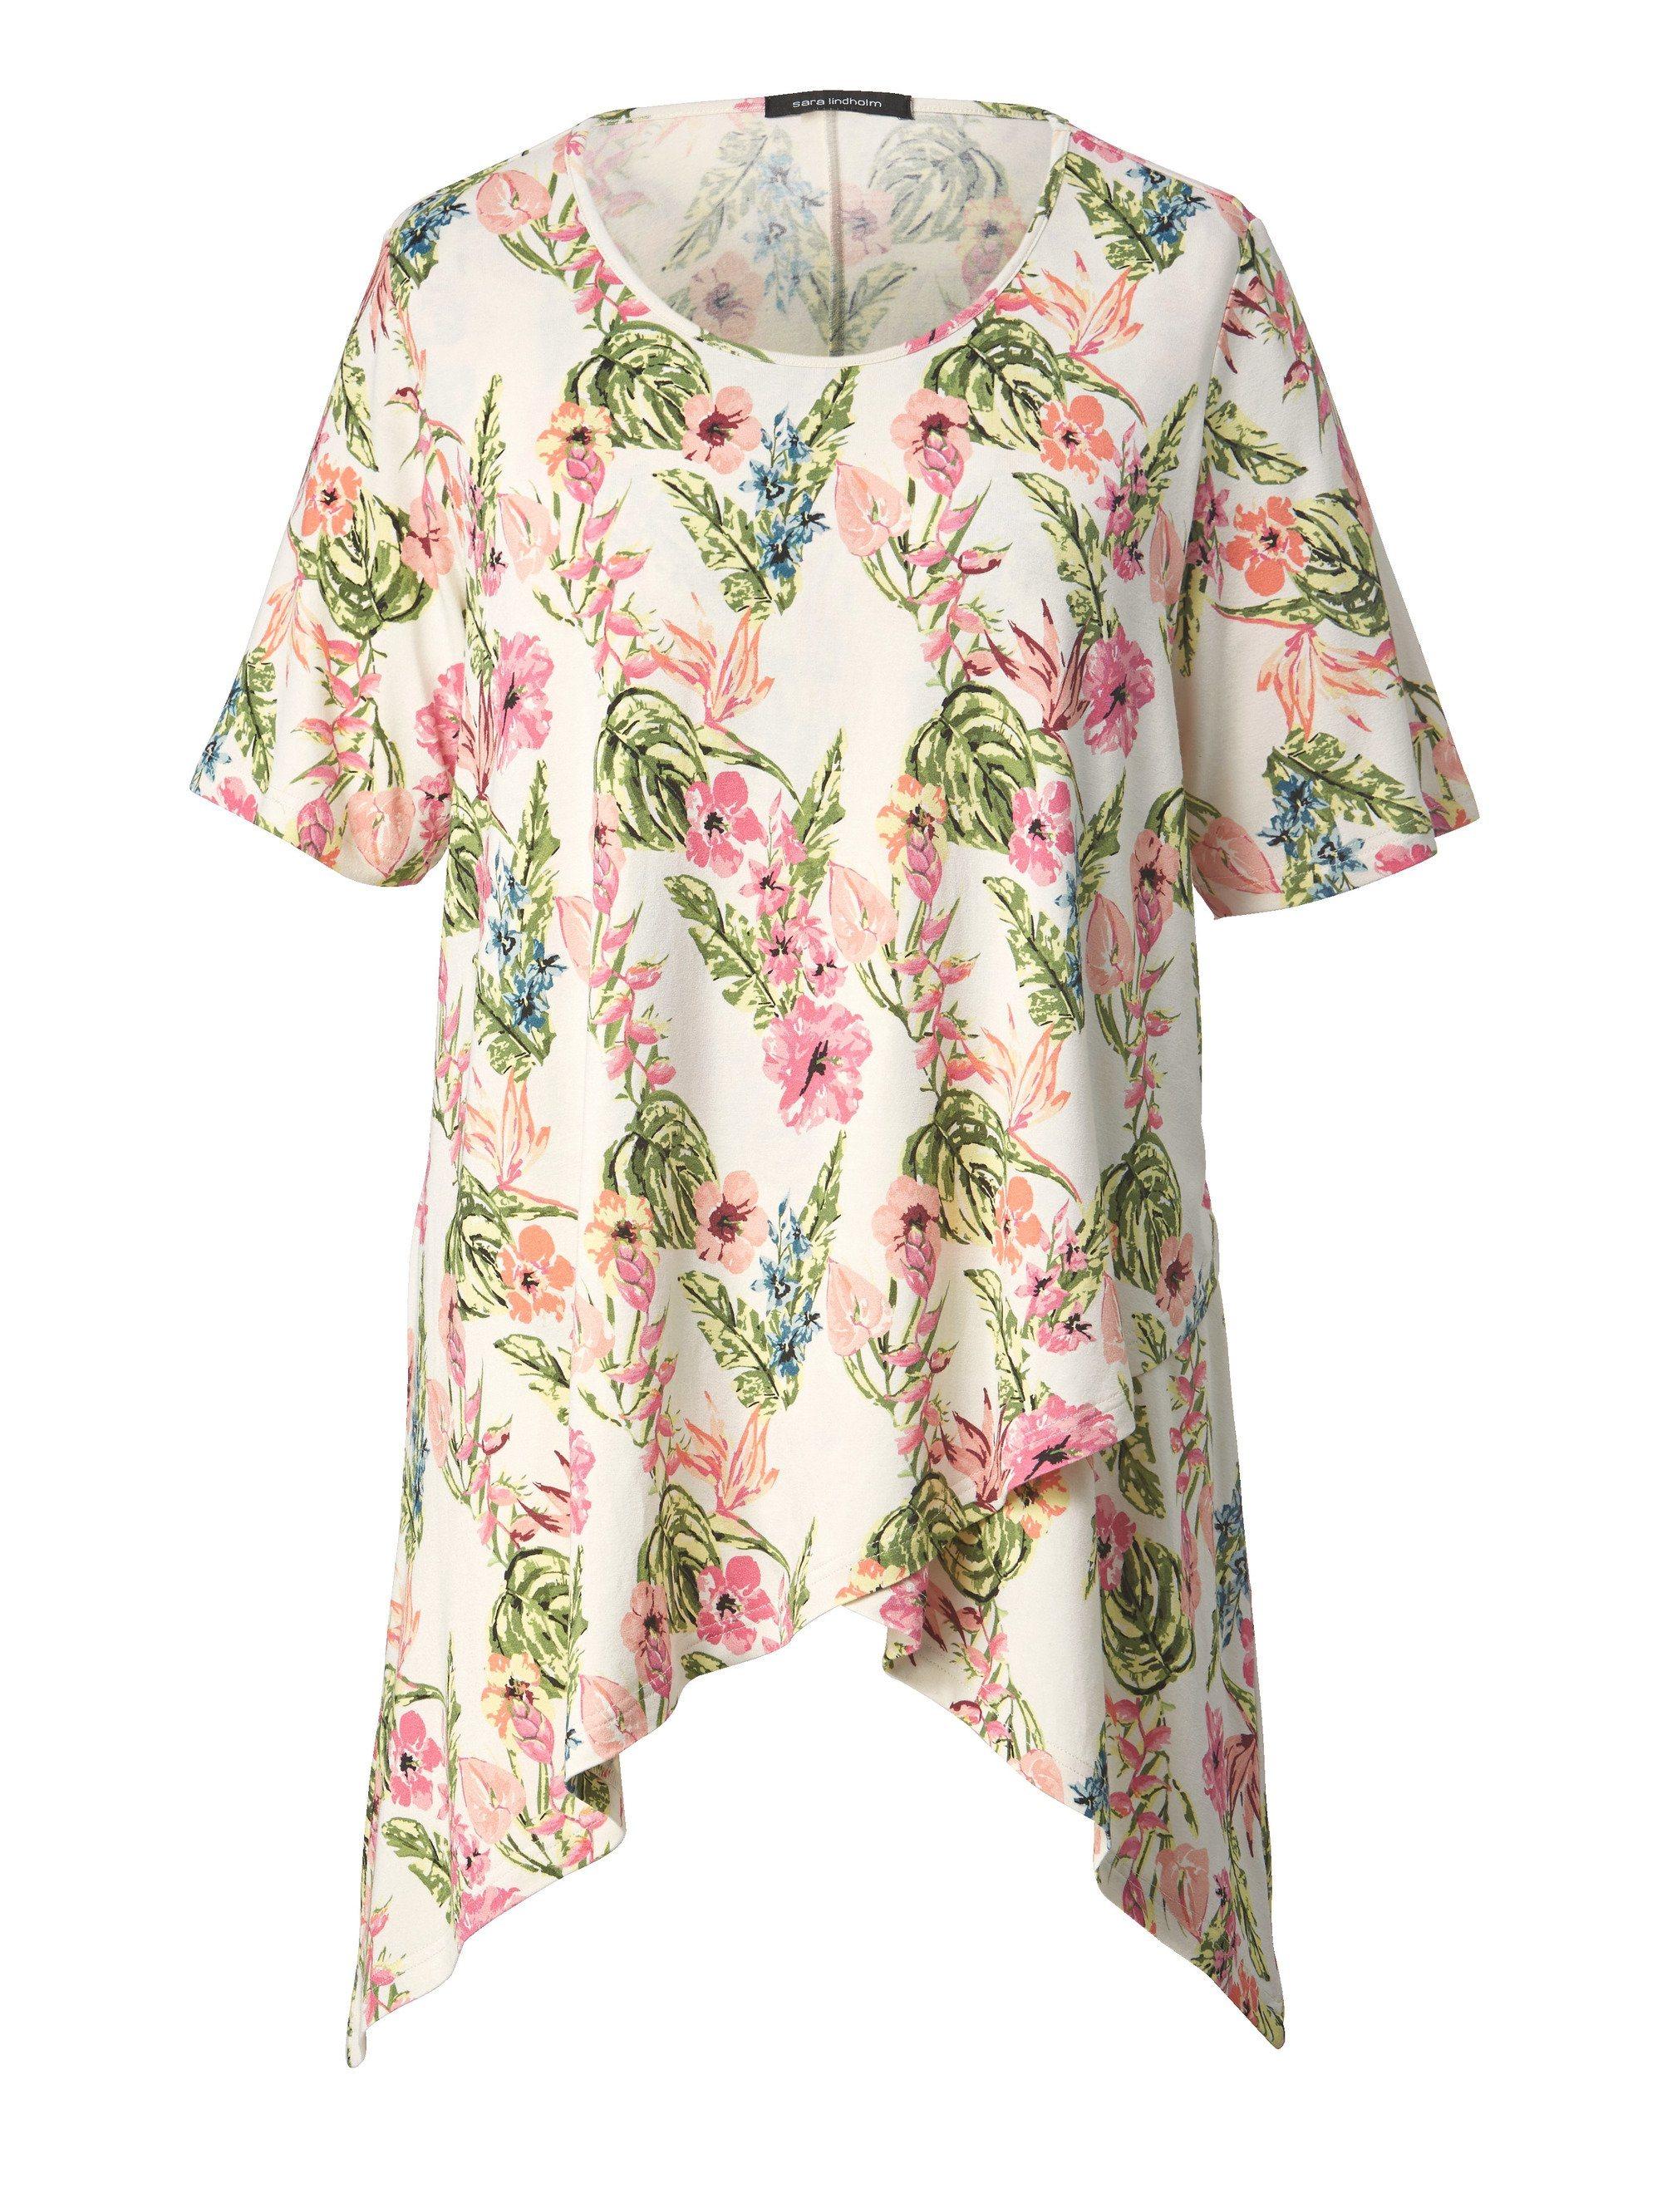 Sara Lindholm by Happy Size Jersey-Tunika mit Zipfelsaum | Bekleidung > Tuniken > Sonstige Tuniken | Print | Jeans - Viskose - Elasthan | Sara Lindholm by Happy Size